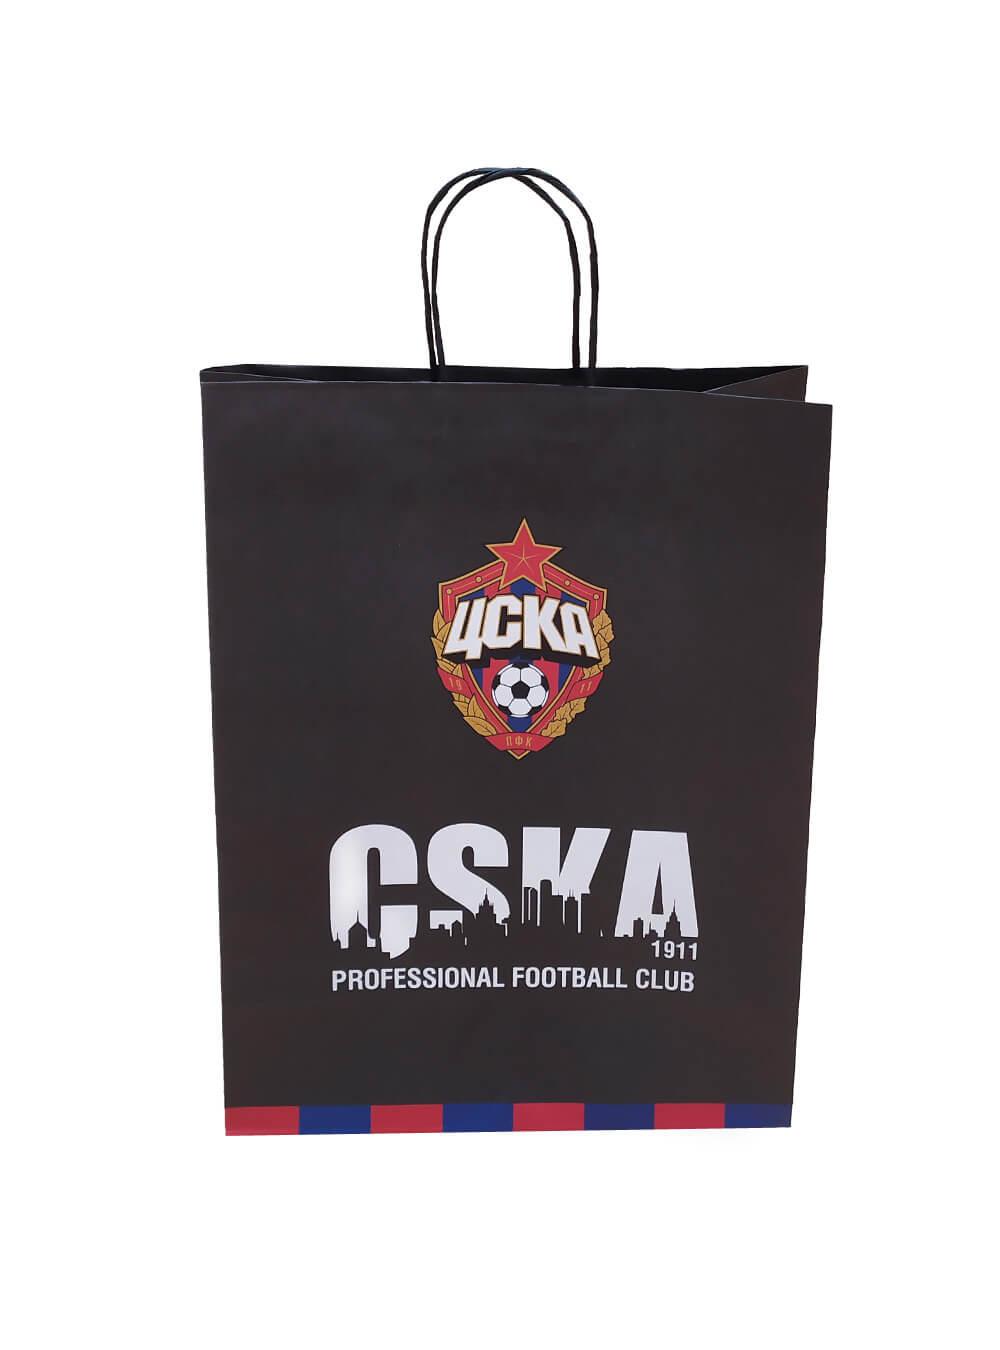 Пакет бумажный подарочный PFC CSKA (42х32х15 см) фото